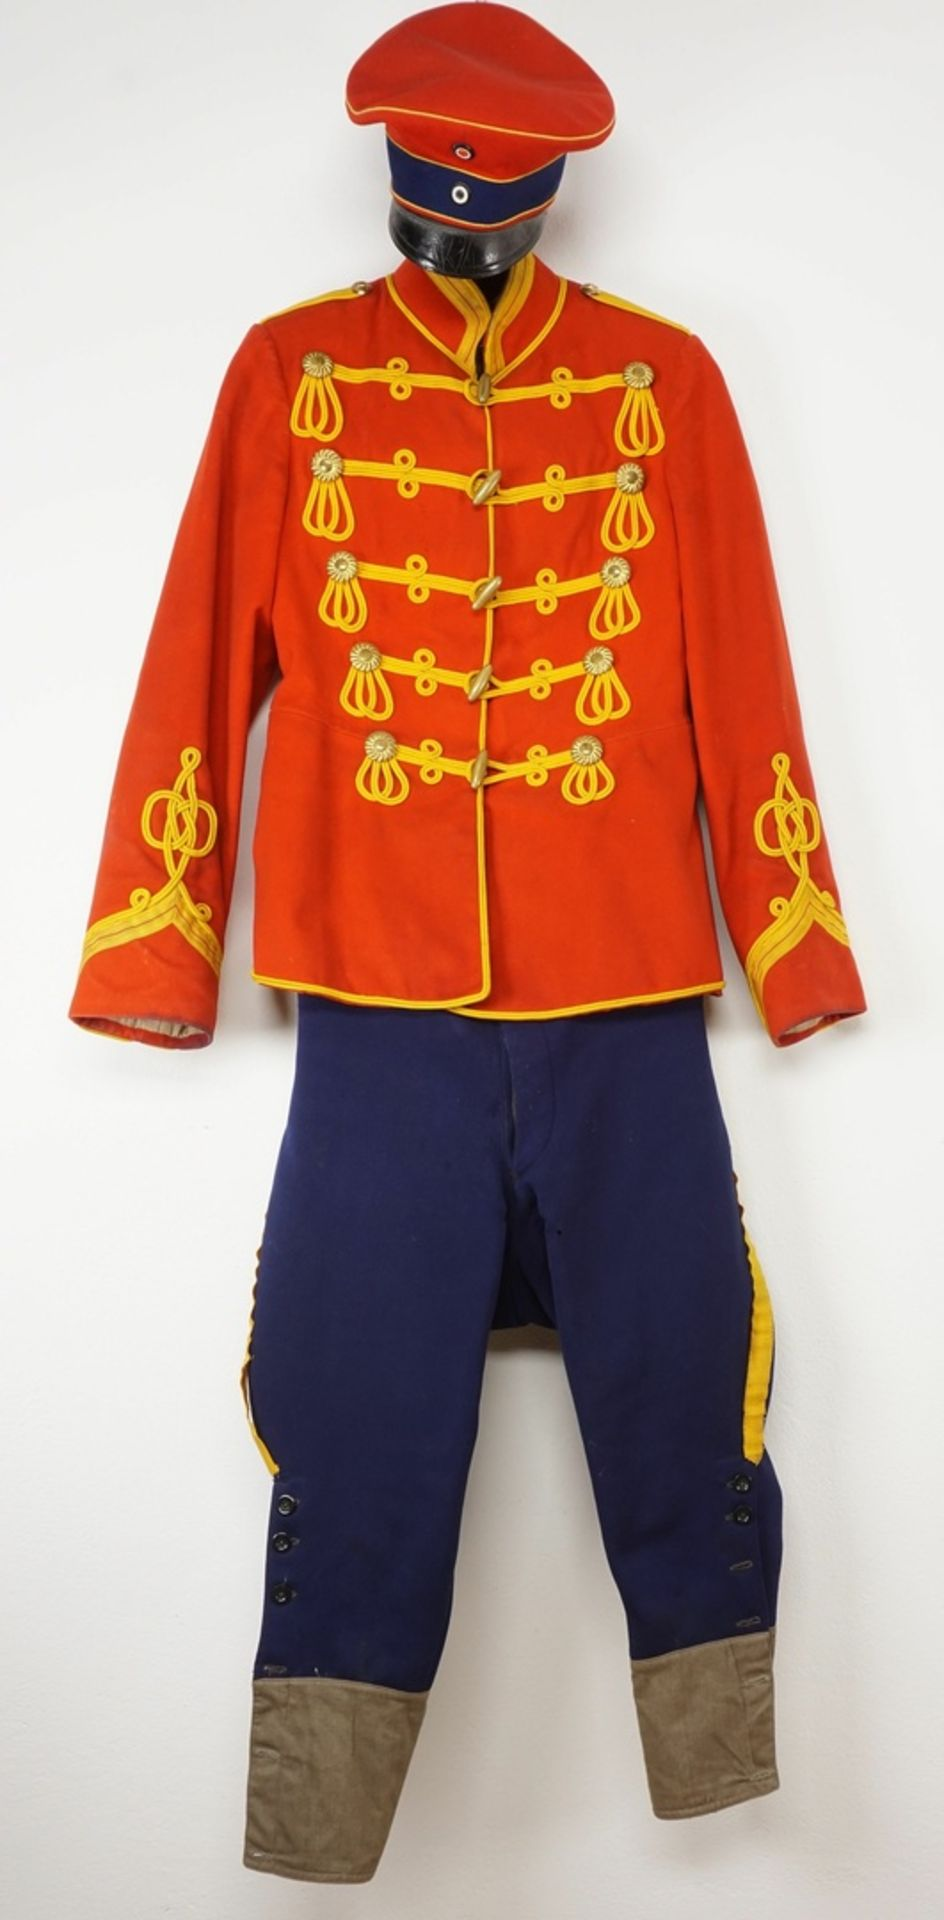 Uniform des Leib-Garde-Husaren-Regiments Potsdam, um 1900